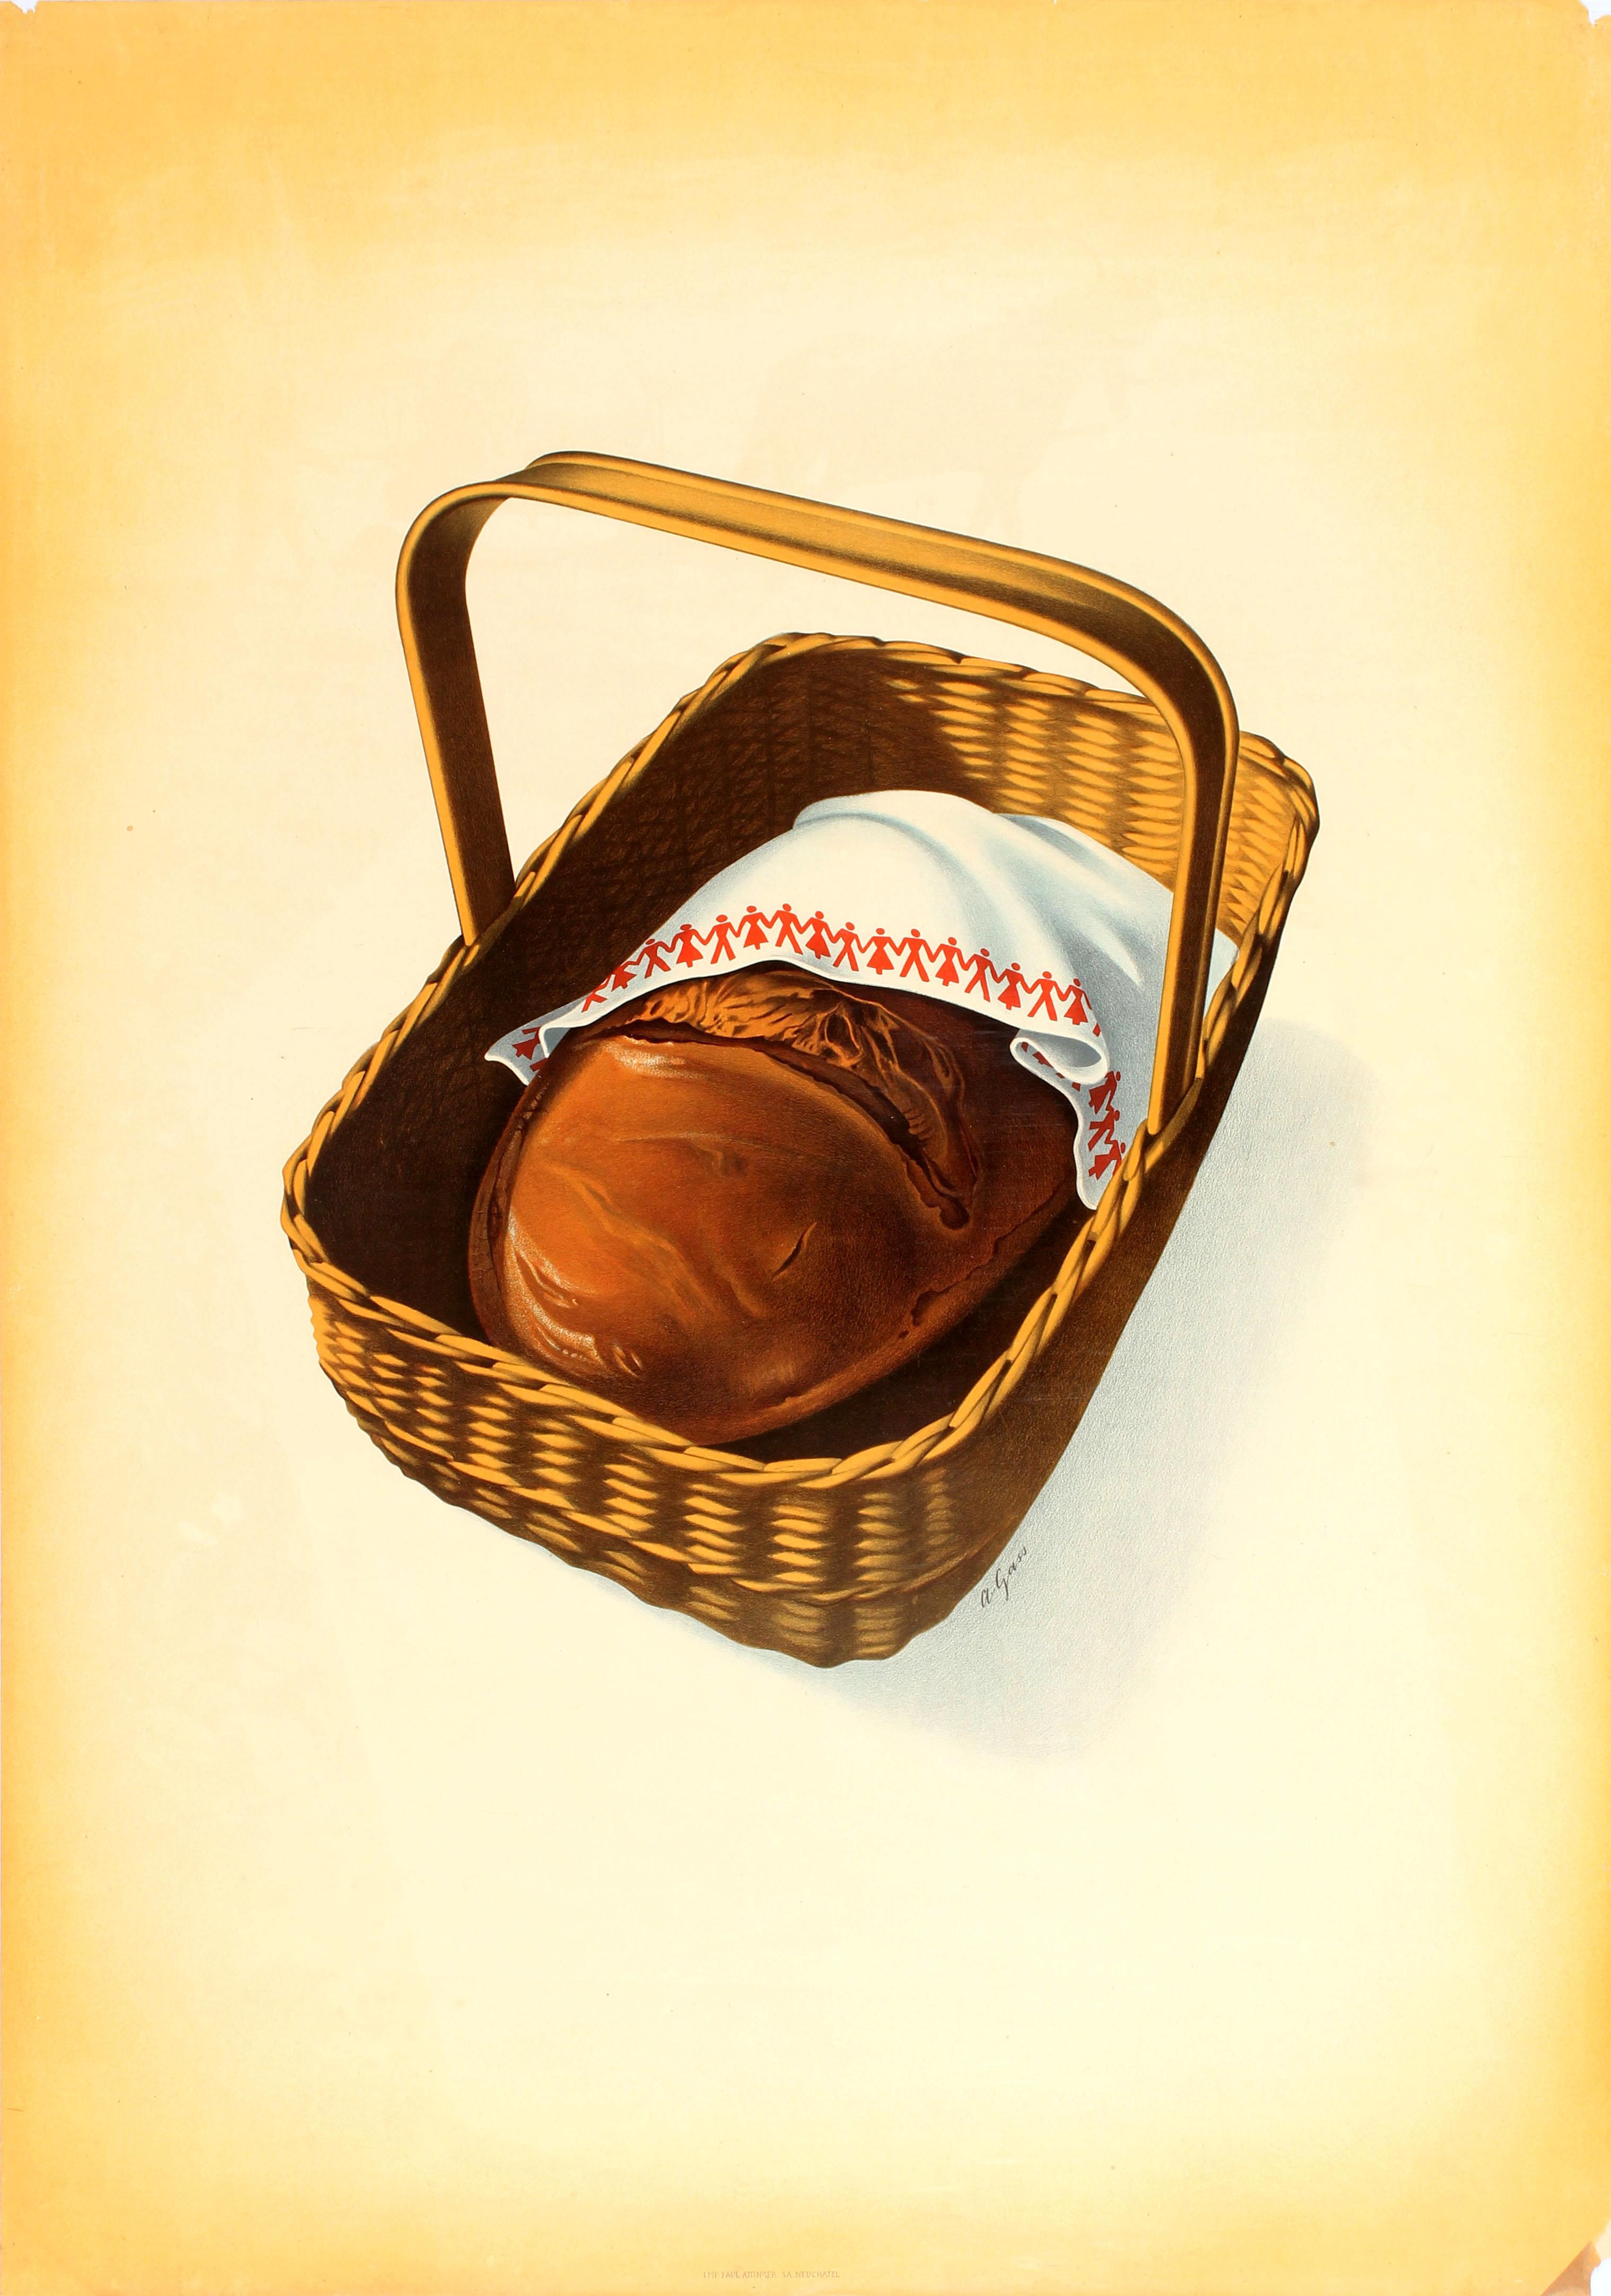 Advertising Poster Coop Switzerland Bread Picnic Basket